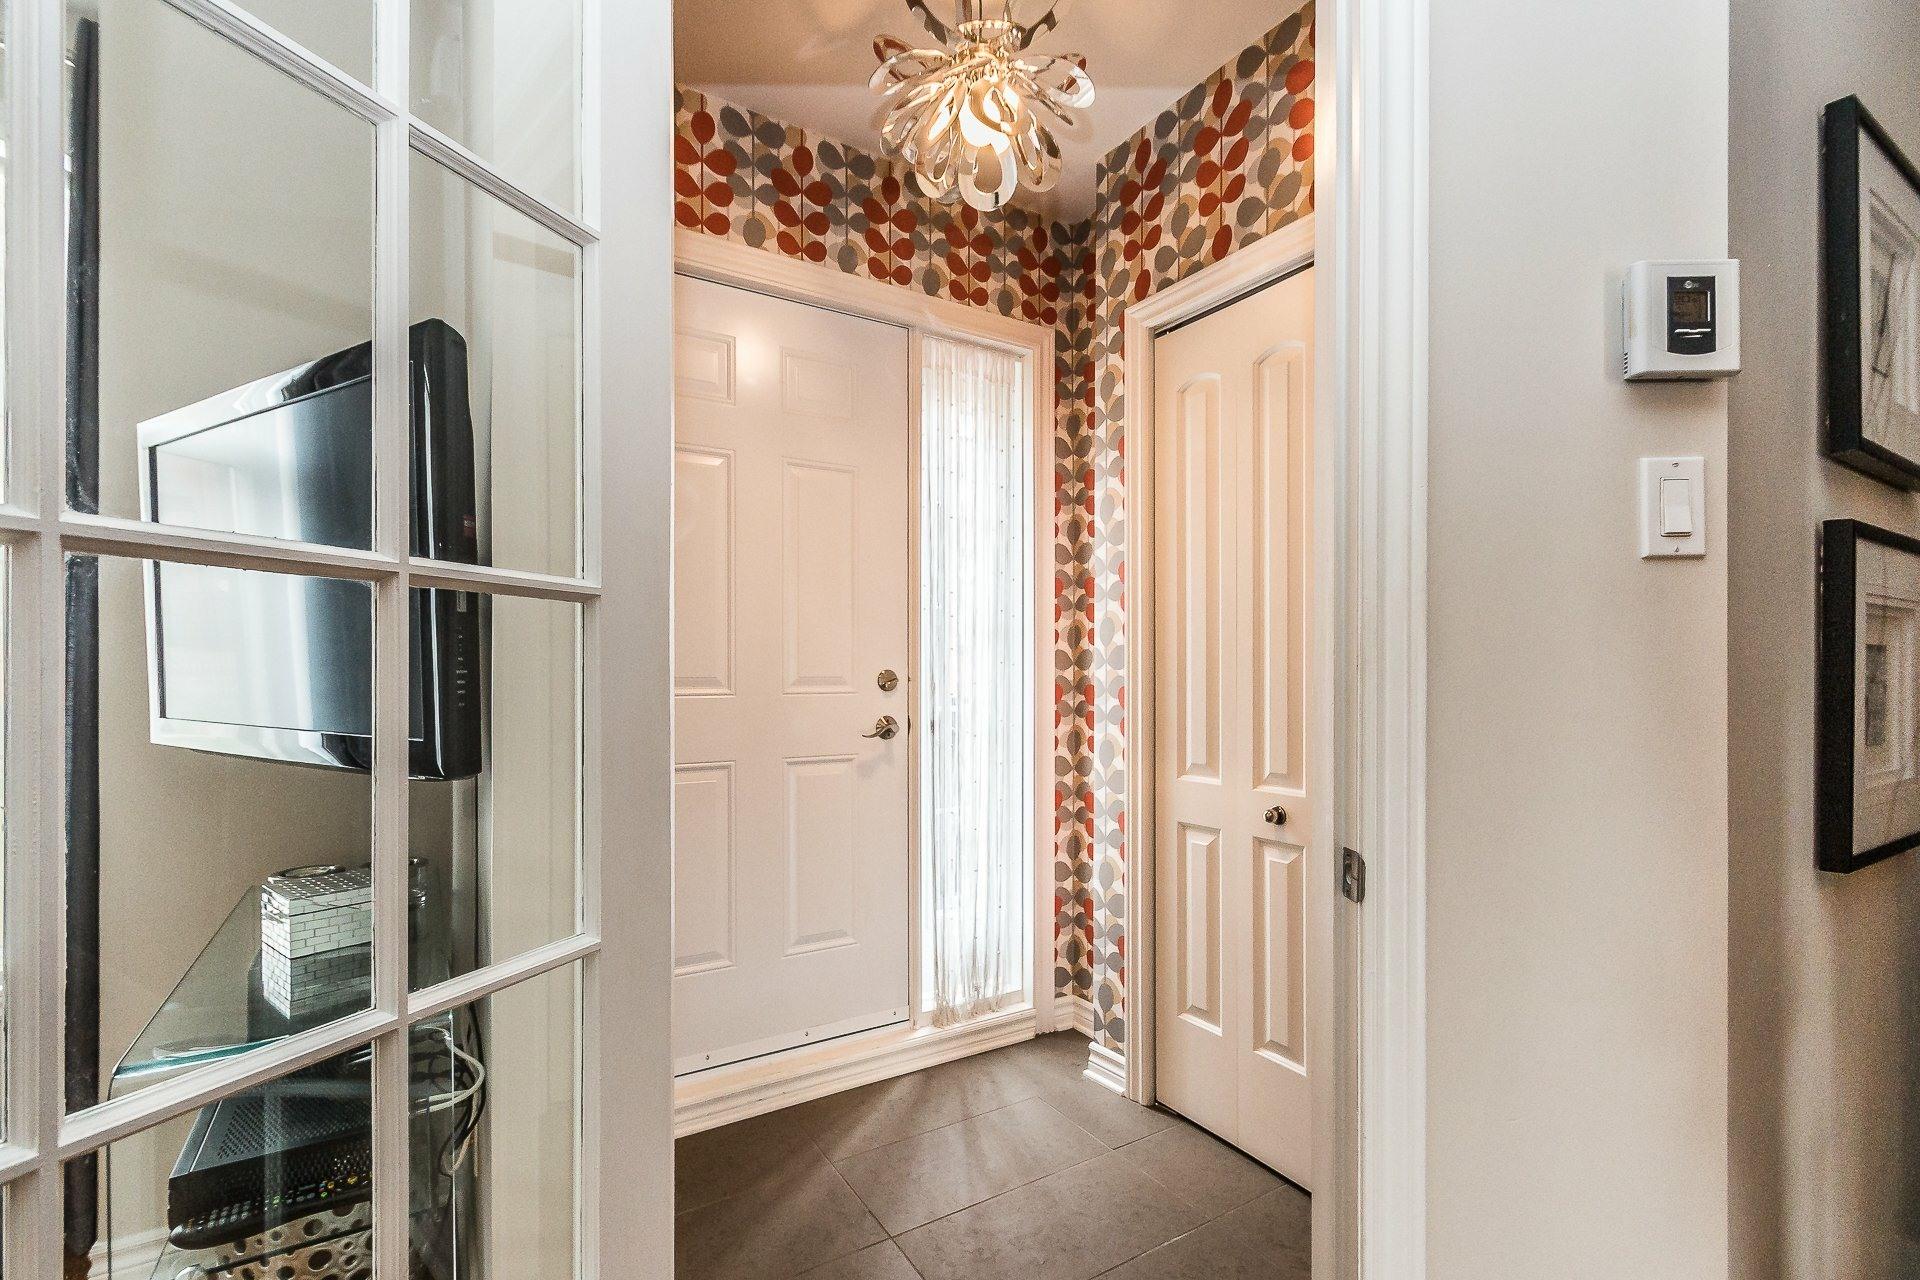 image 2 - MX - Casa sola - MX En venta Montréal Lachine  - 8 habitaciones